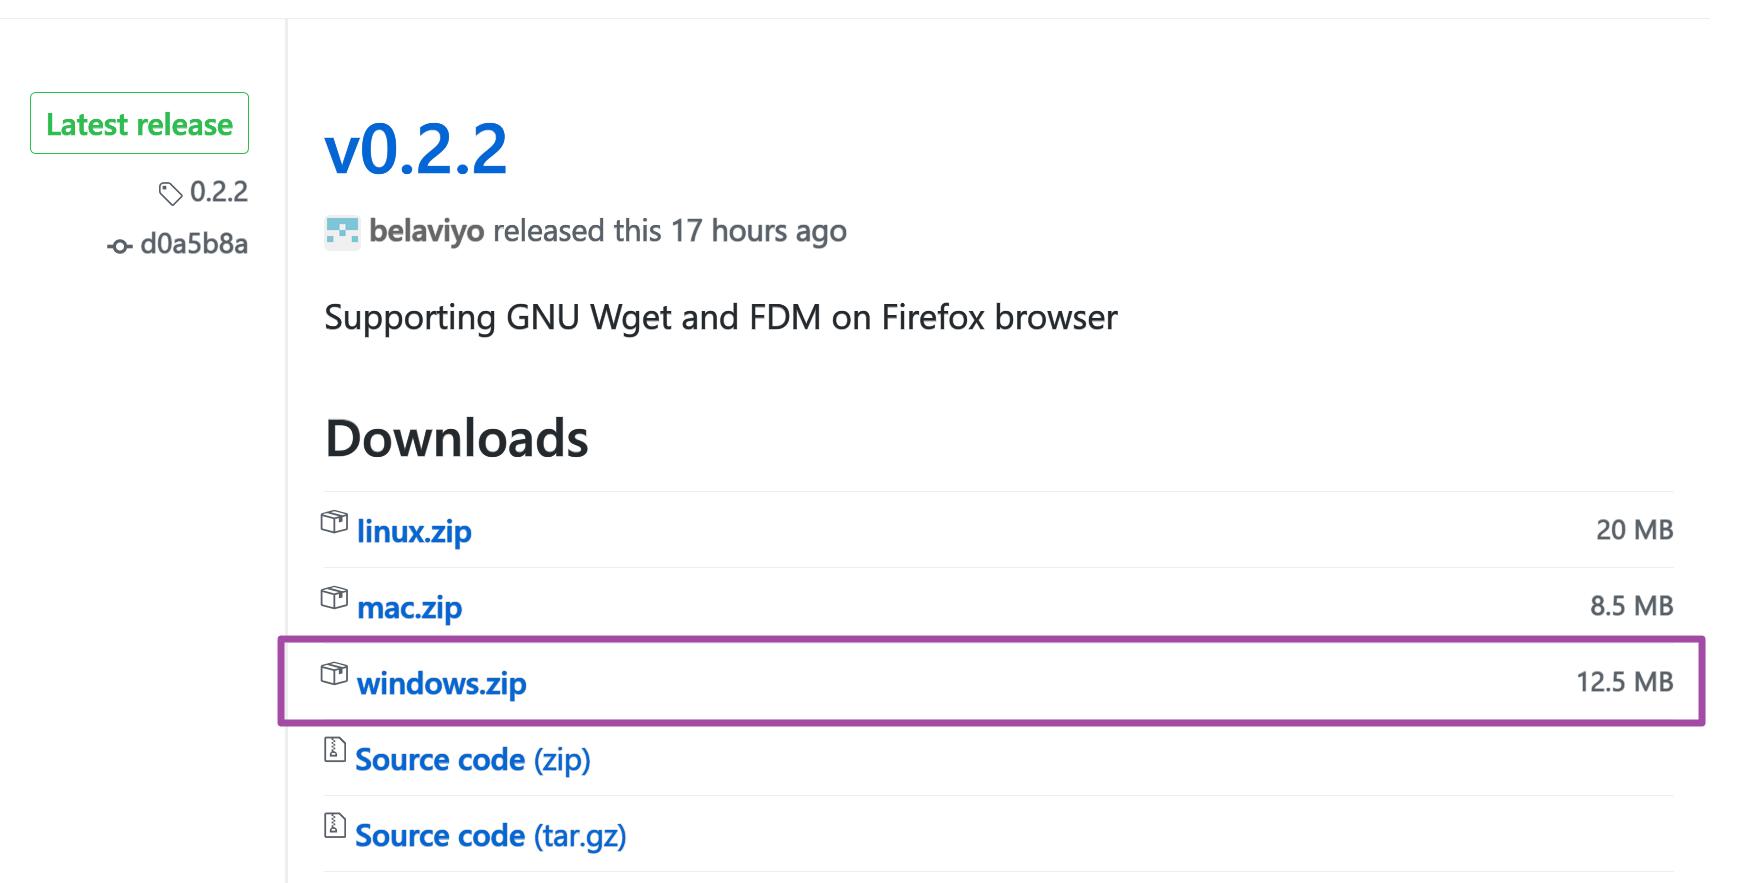 下載 idm 用 native client